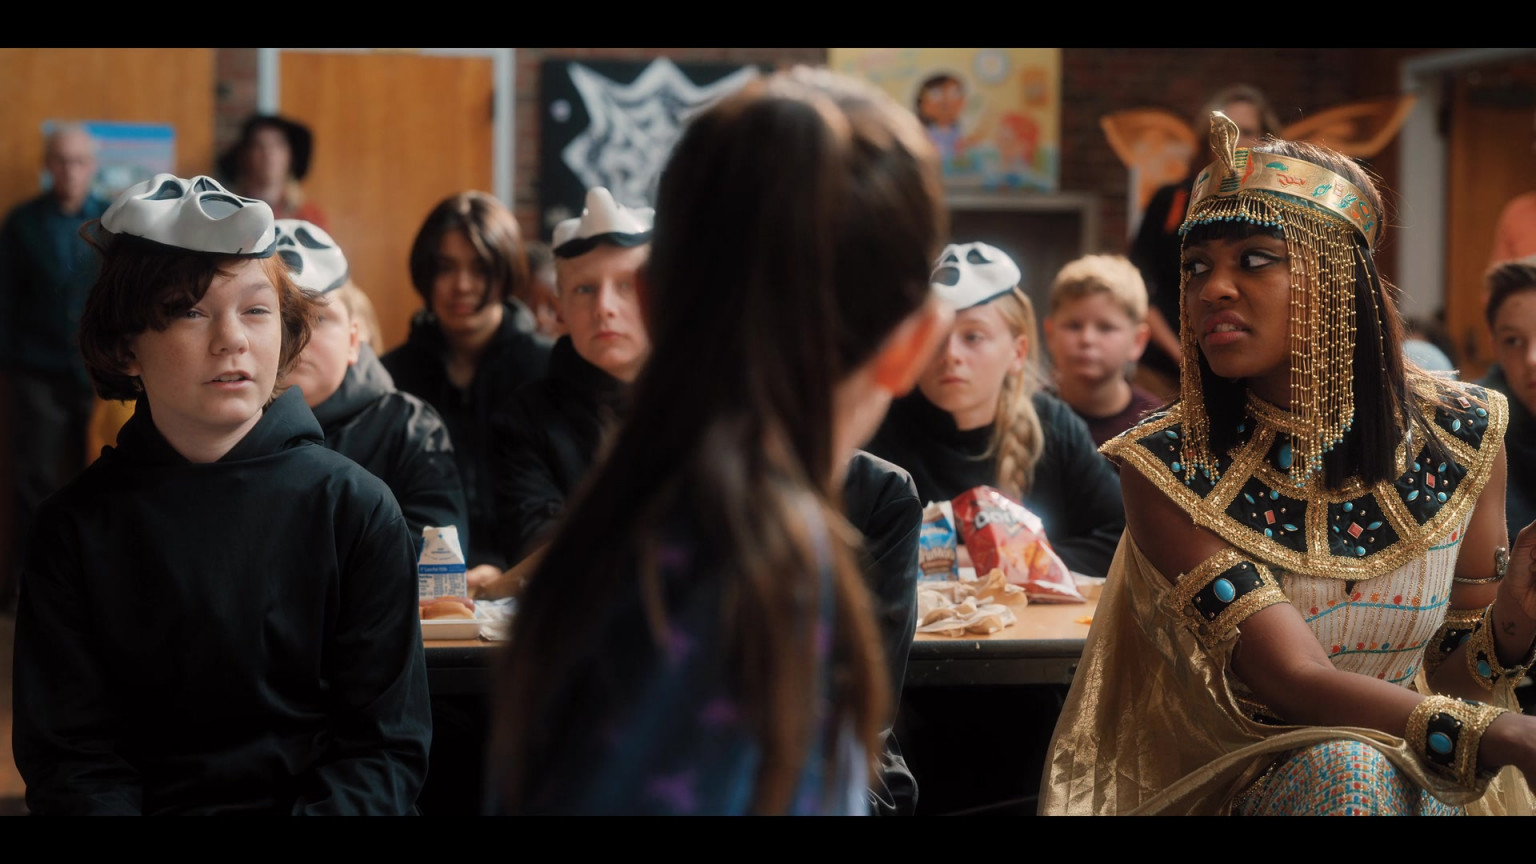 Hubie halloween is a 2020 american halloween comedy horror film directed by steven brill, written by adam sandler and tim herlihy, and starring an ensemble cast consisting of sandler, kevin james, julie bowen, ray liotta, rob schneider, june squibb, kenan thompson, shaquille o'neal, steve buscemi, maya rudolph, tim meadows, karan brar, paris berelc, noah … Doritos Chips In Hubie Halloween (2020)